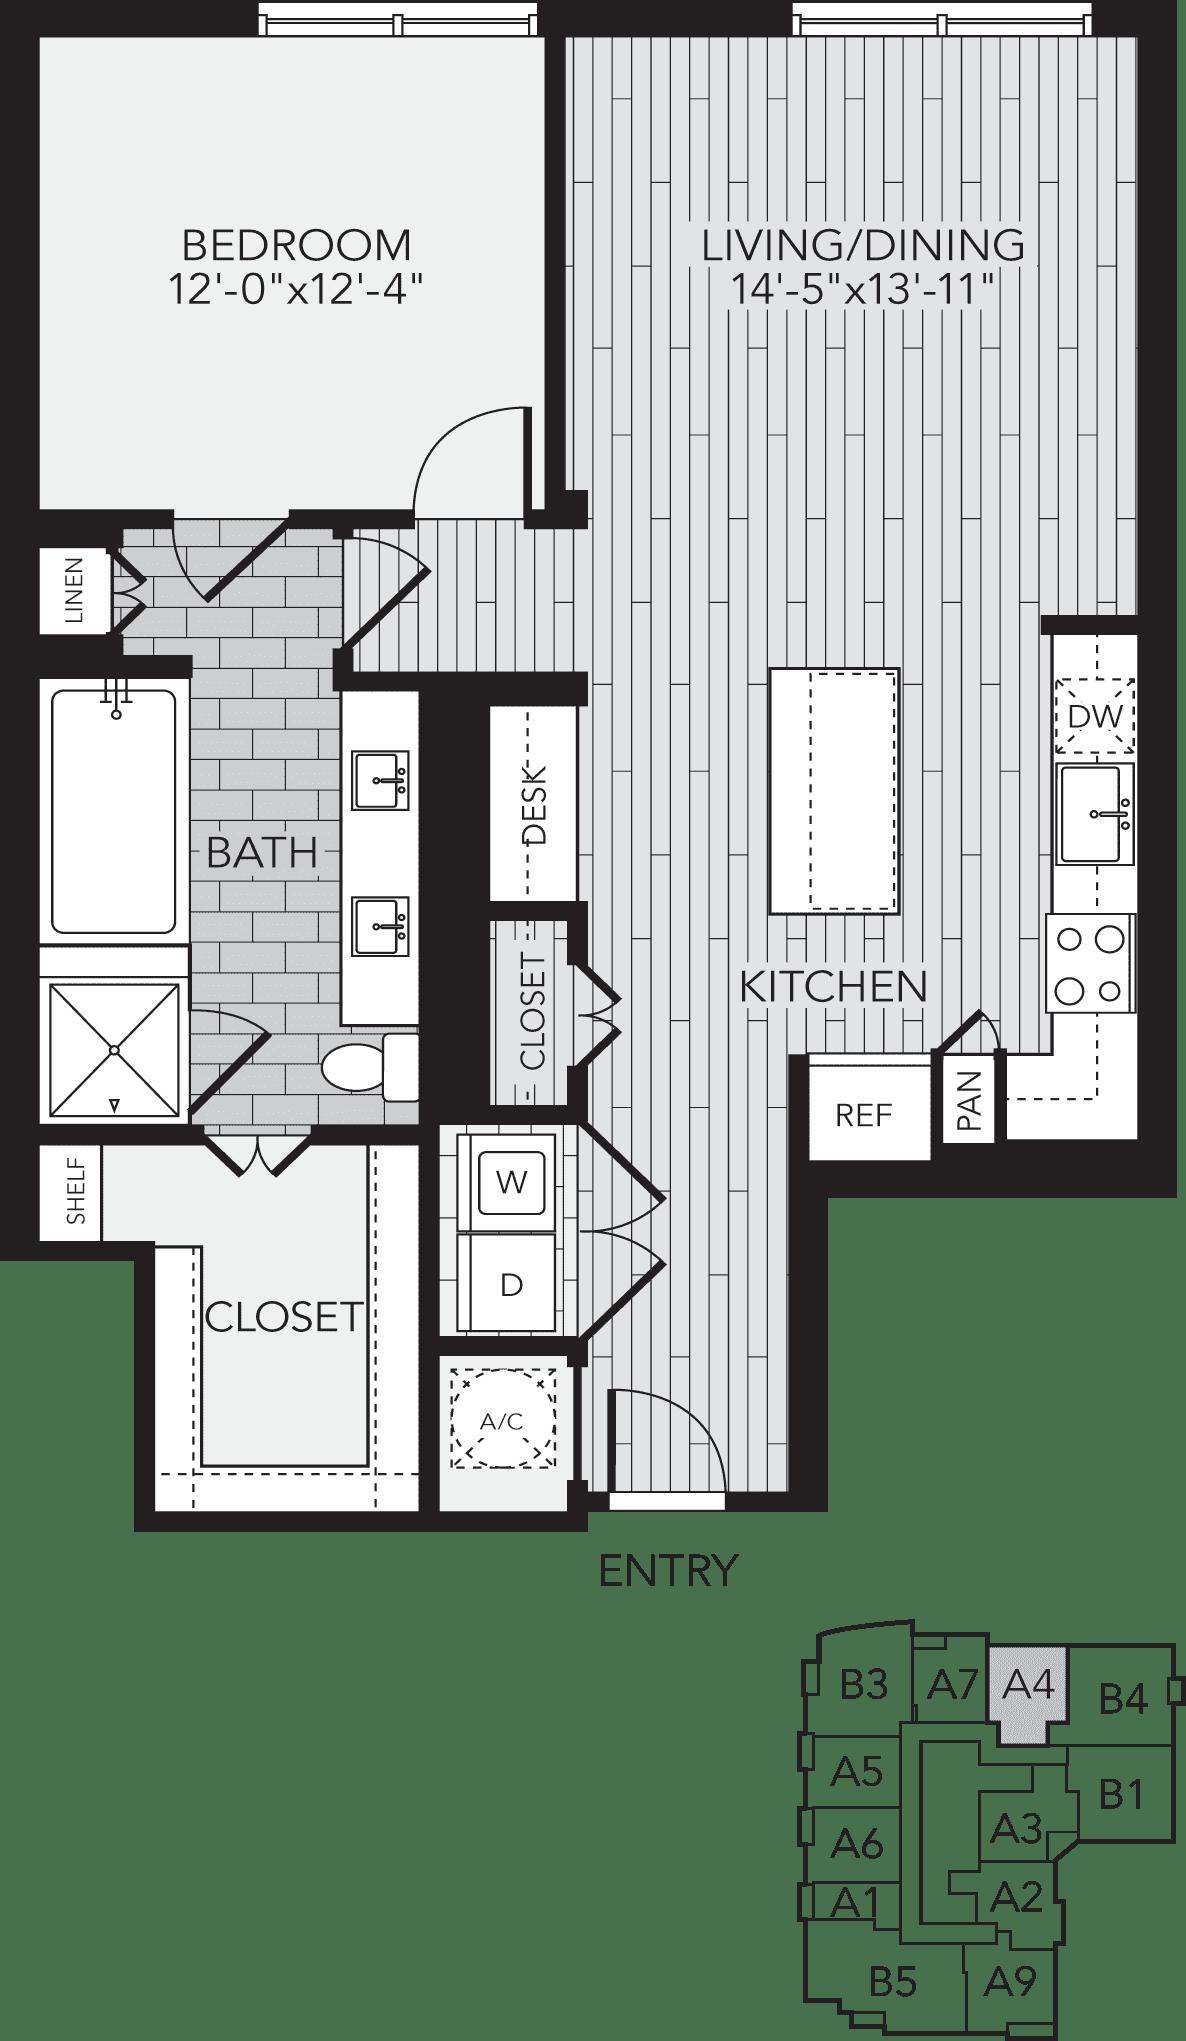 A4 Houston One Bedroom Apartment Floor Plan